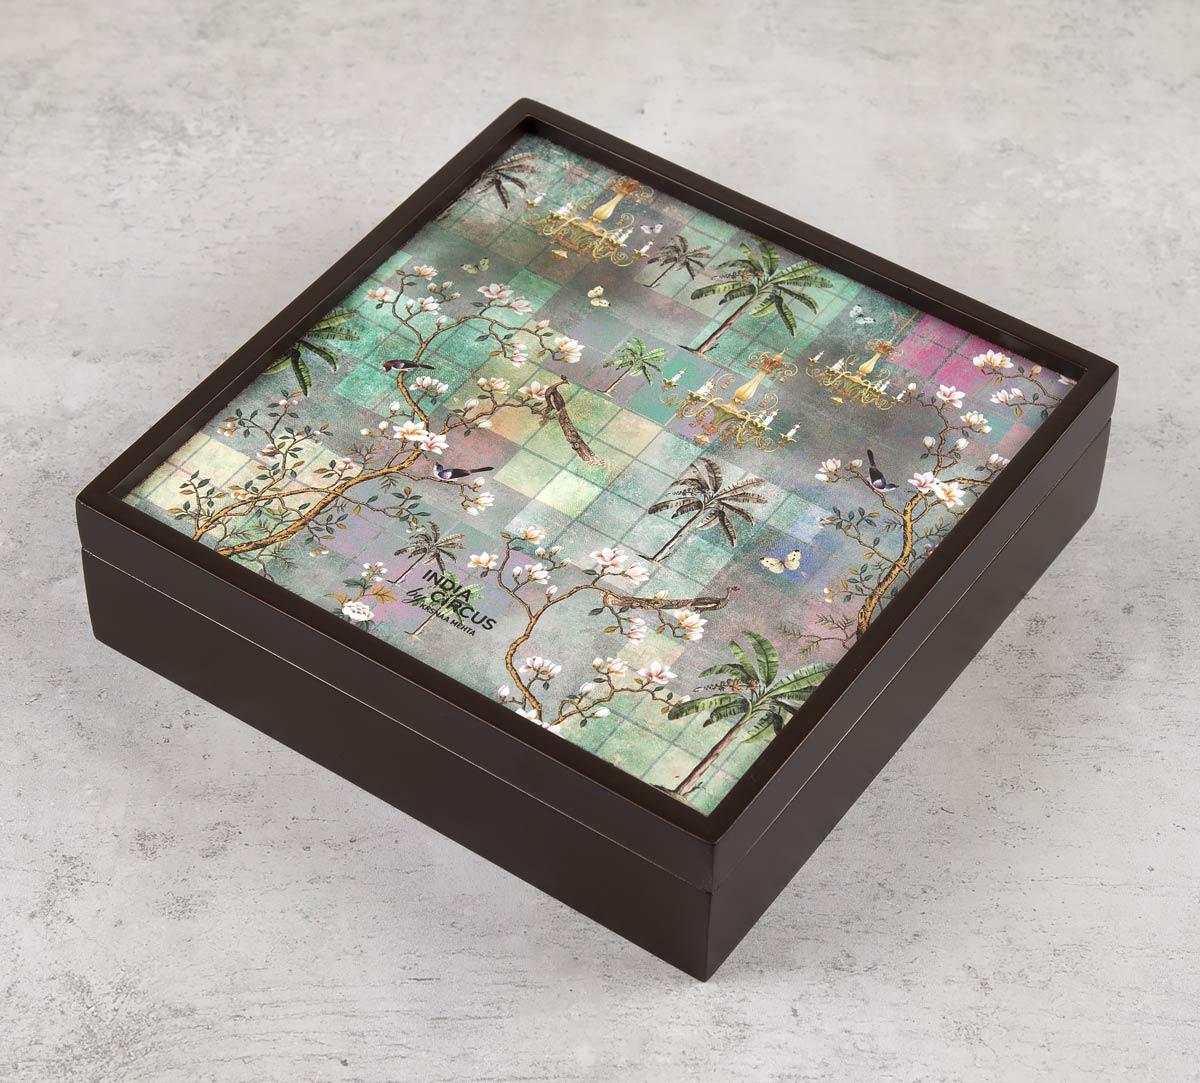 Chandelier Jungle Small Storage Box